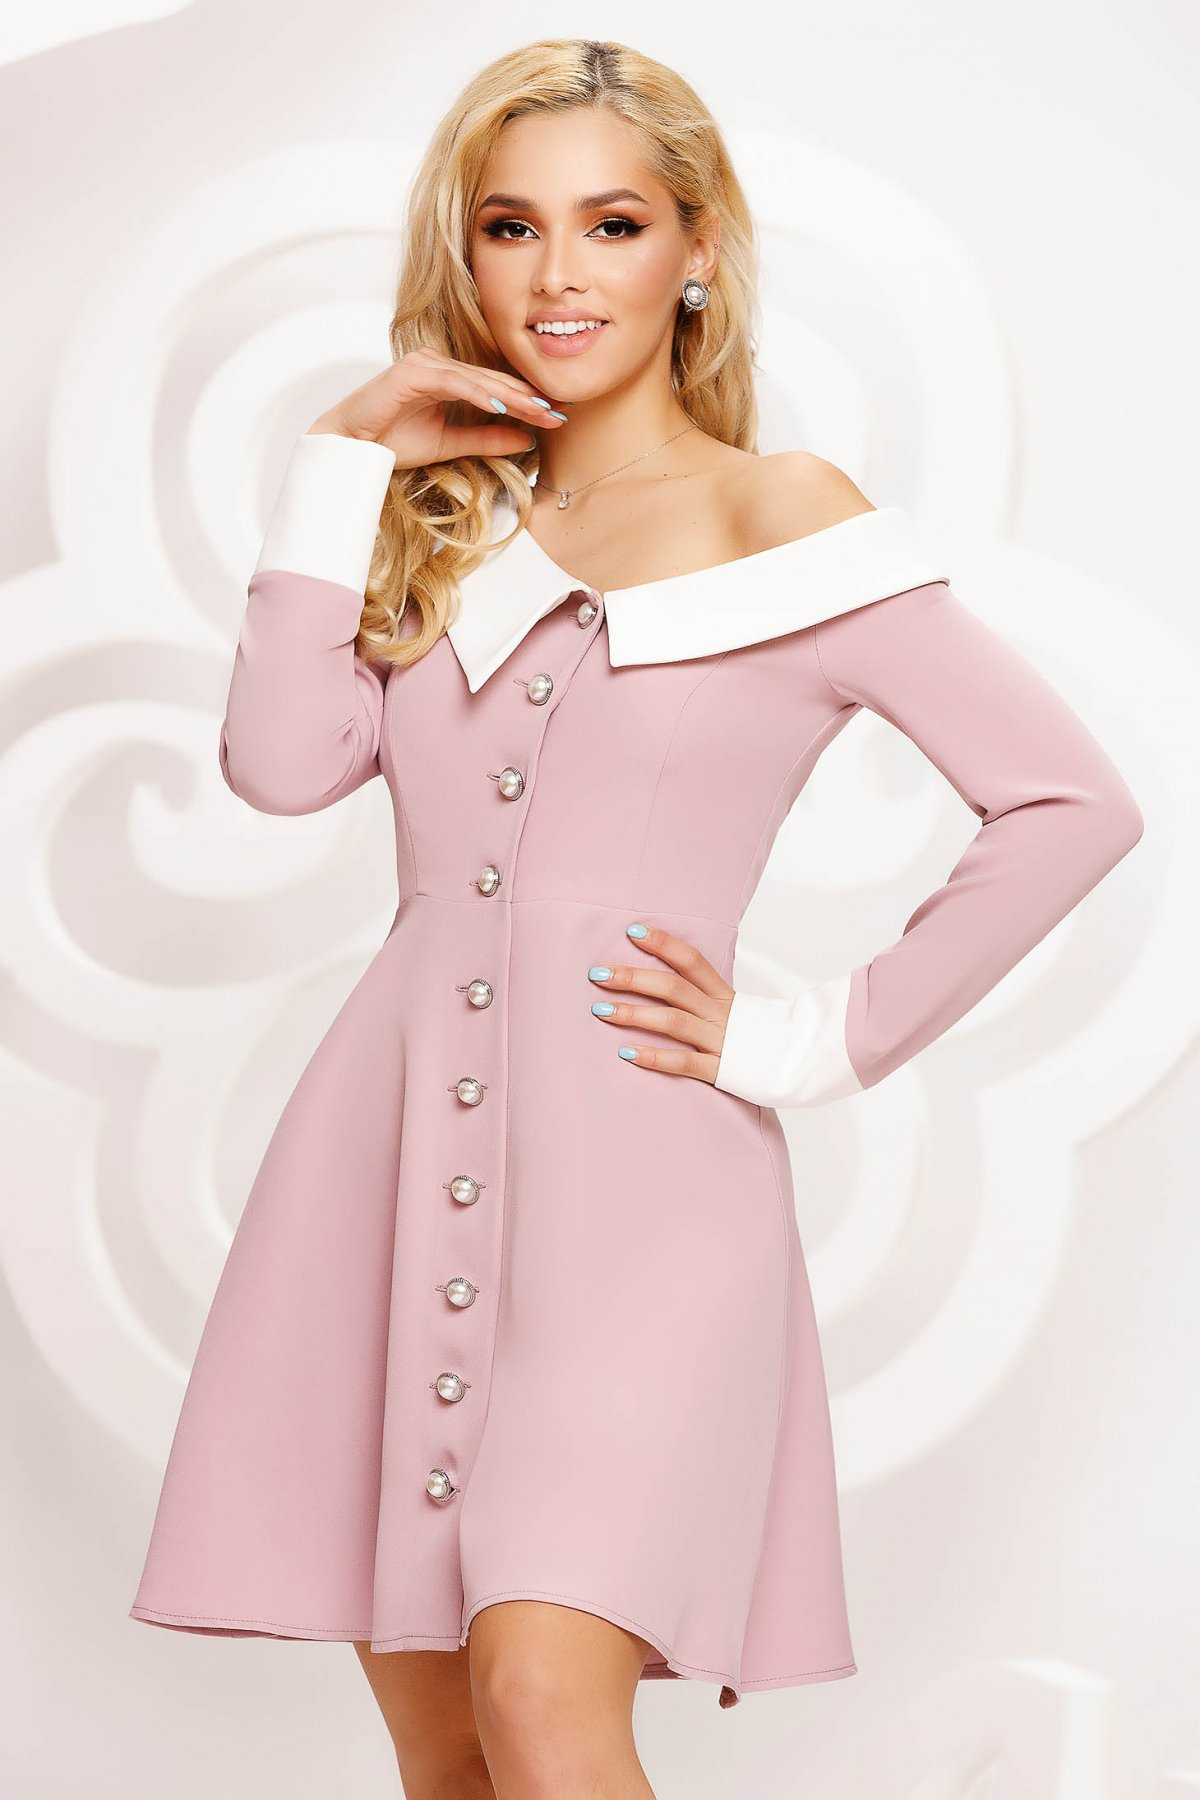 Rochie Artista roz prafuit de ocazie in clos pe umar accesorizata cu nasturi si guler - medelin.ro